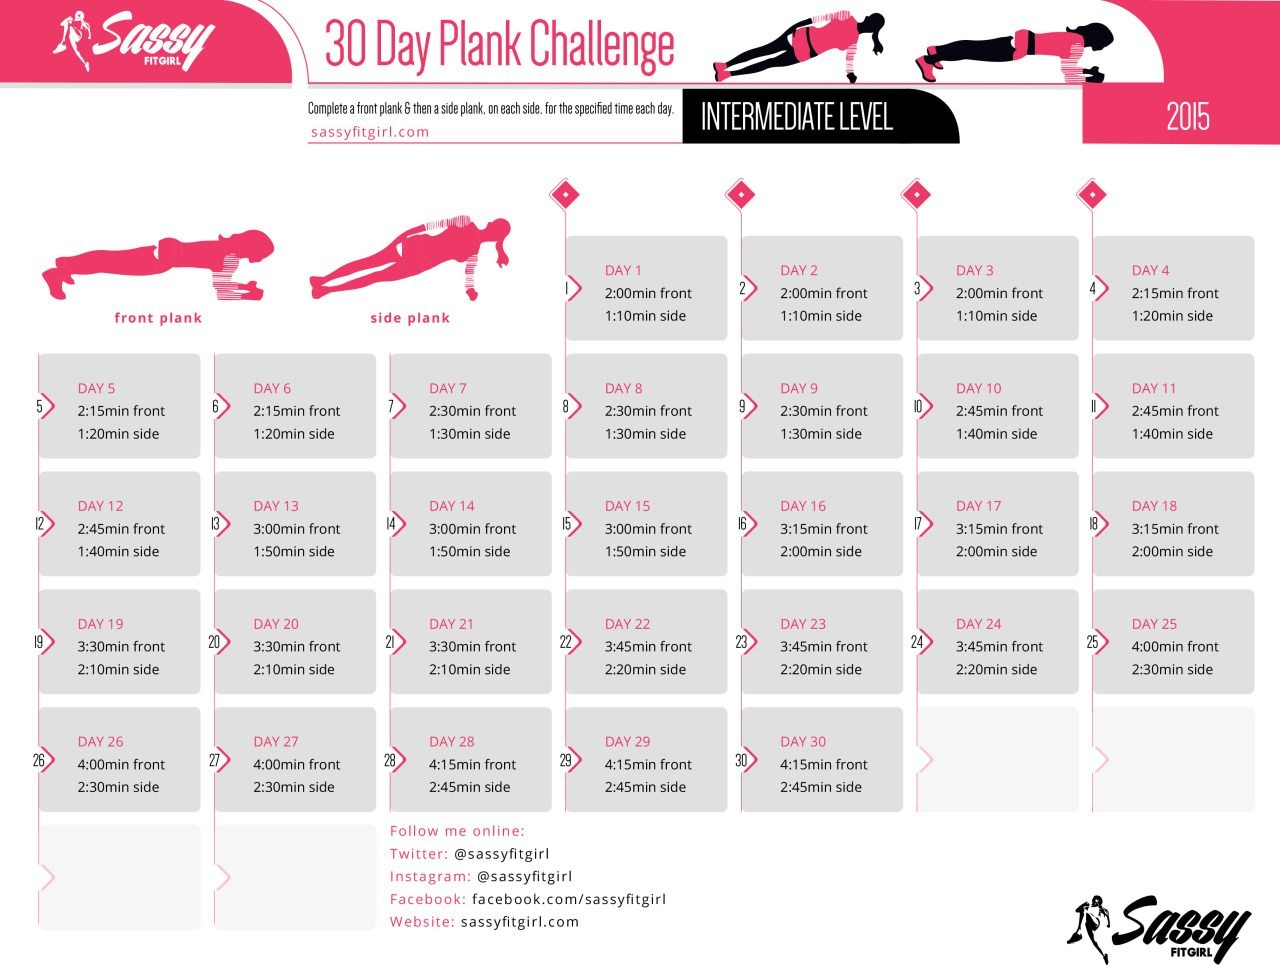 Sassy Fit Girl — 30 Day Plank Challenge - Intermediate Level